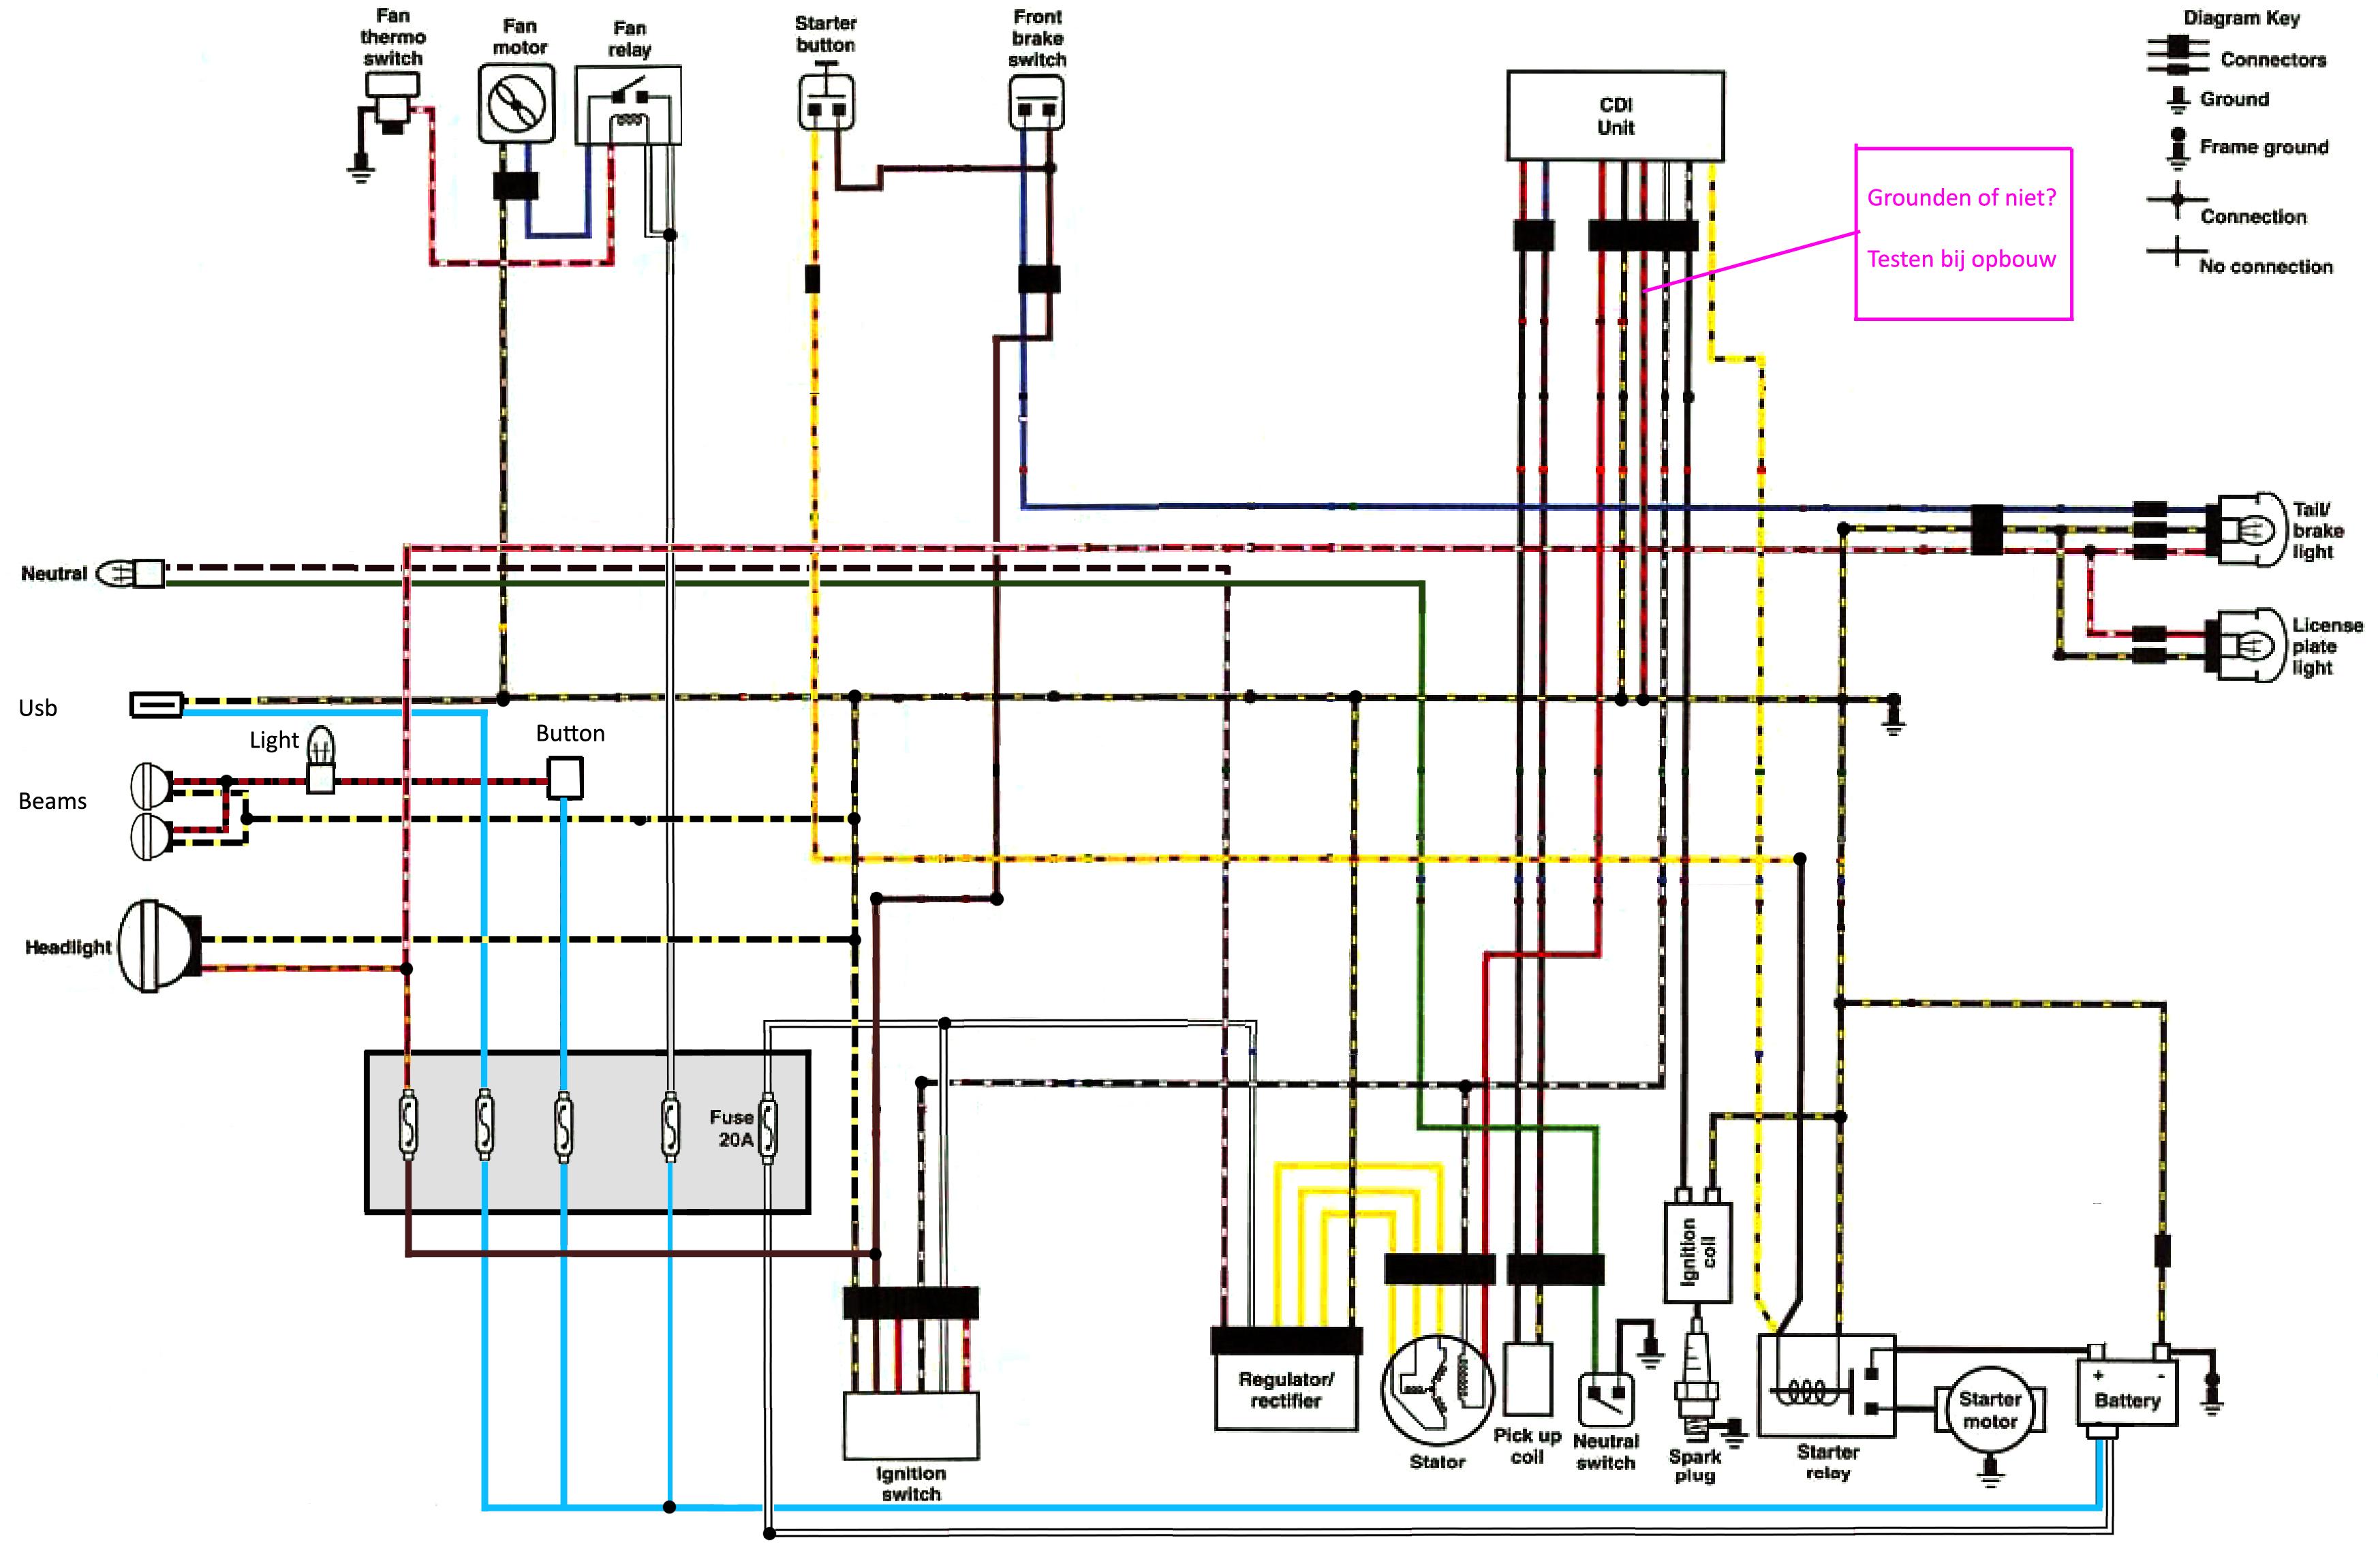 kawasaki 650r wiring diagram - wiring diagram path-venus-b -  path-venus-b.progettosilver.it  progettosilver.it